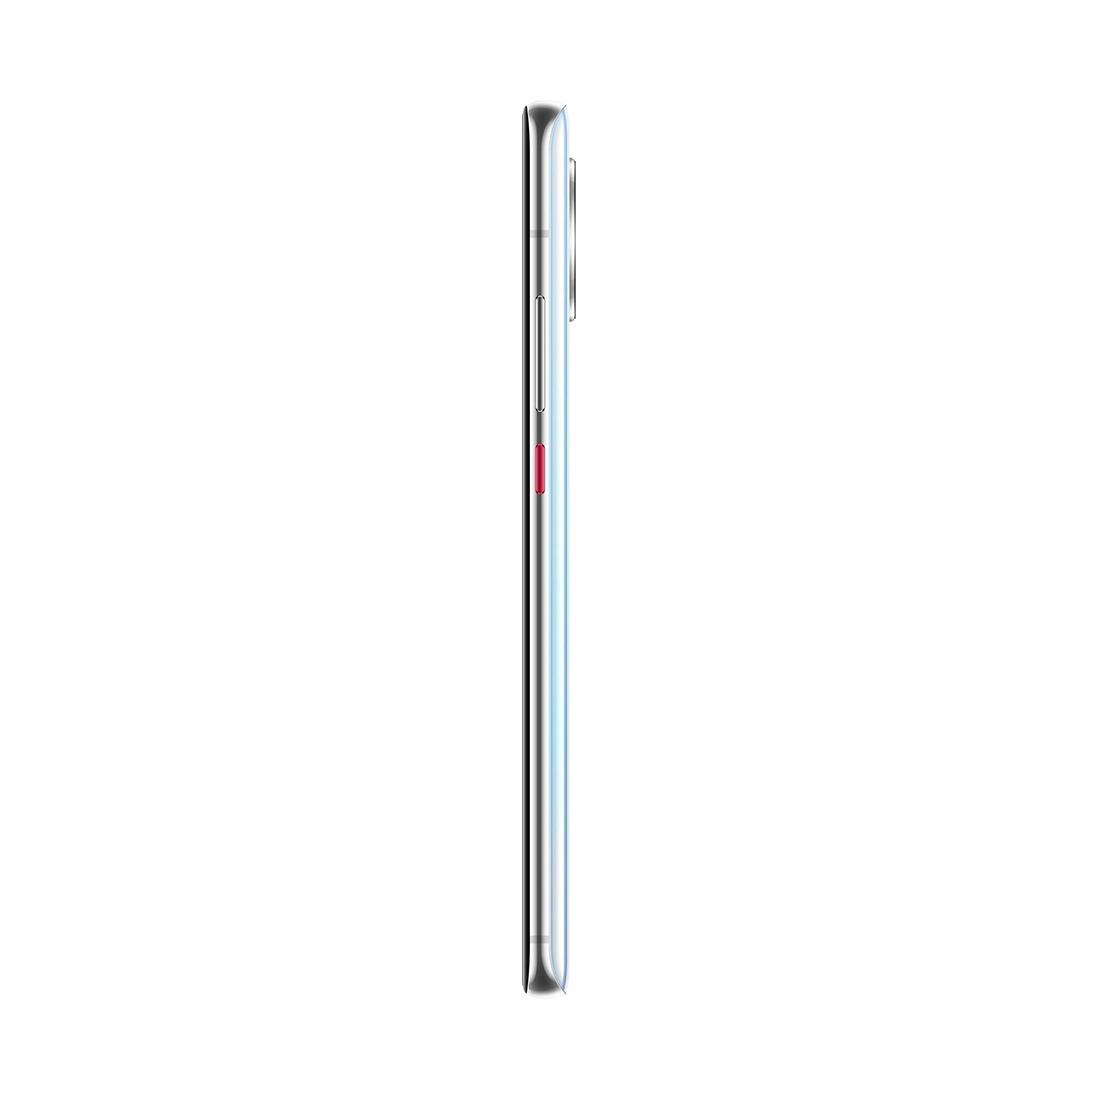 Xiaomi POCO F2 Pro 8/256GB 864064044525484 - 3